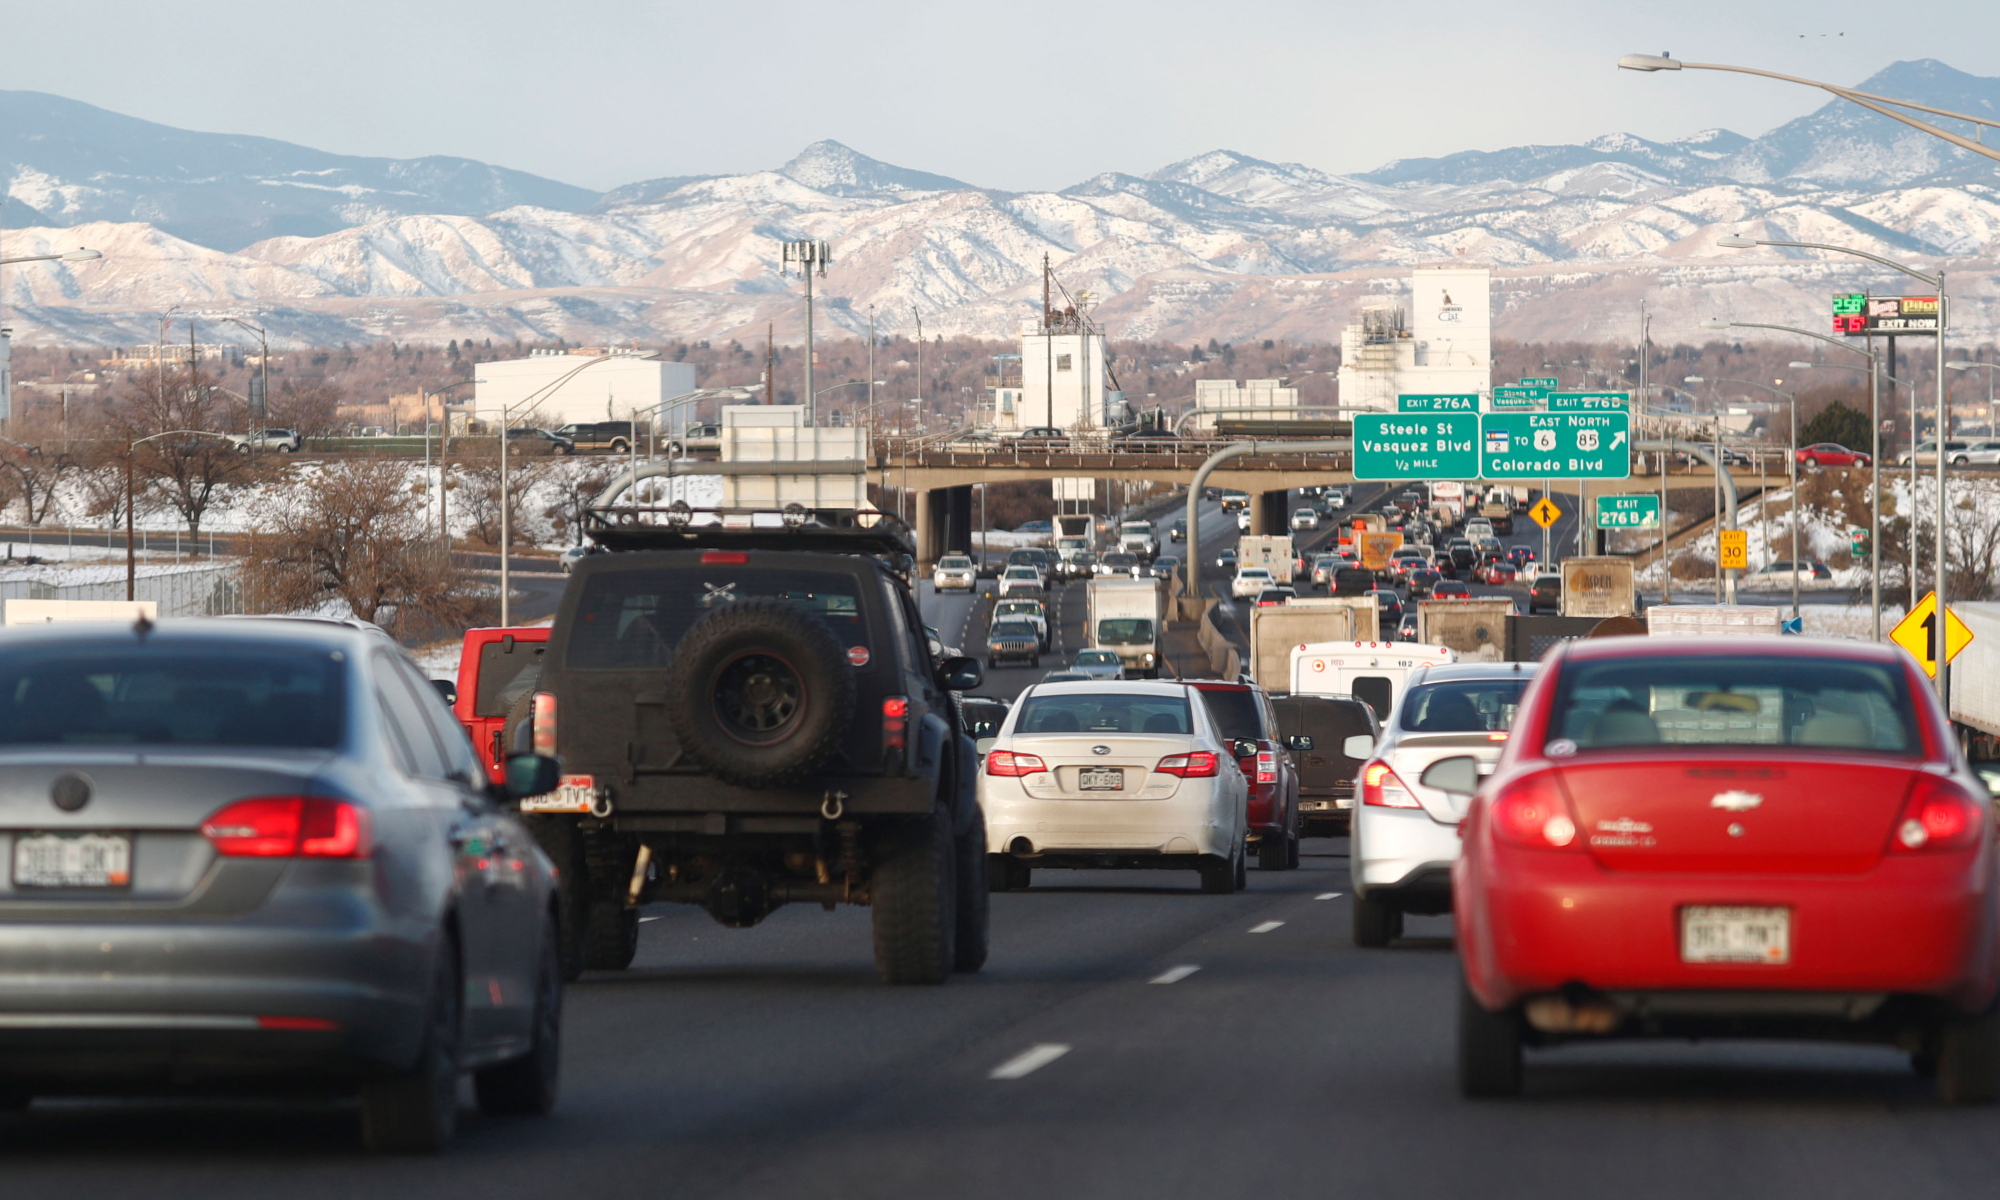 Traffic jam in Denver, Colorado